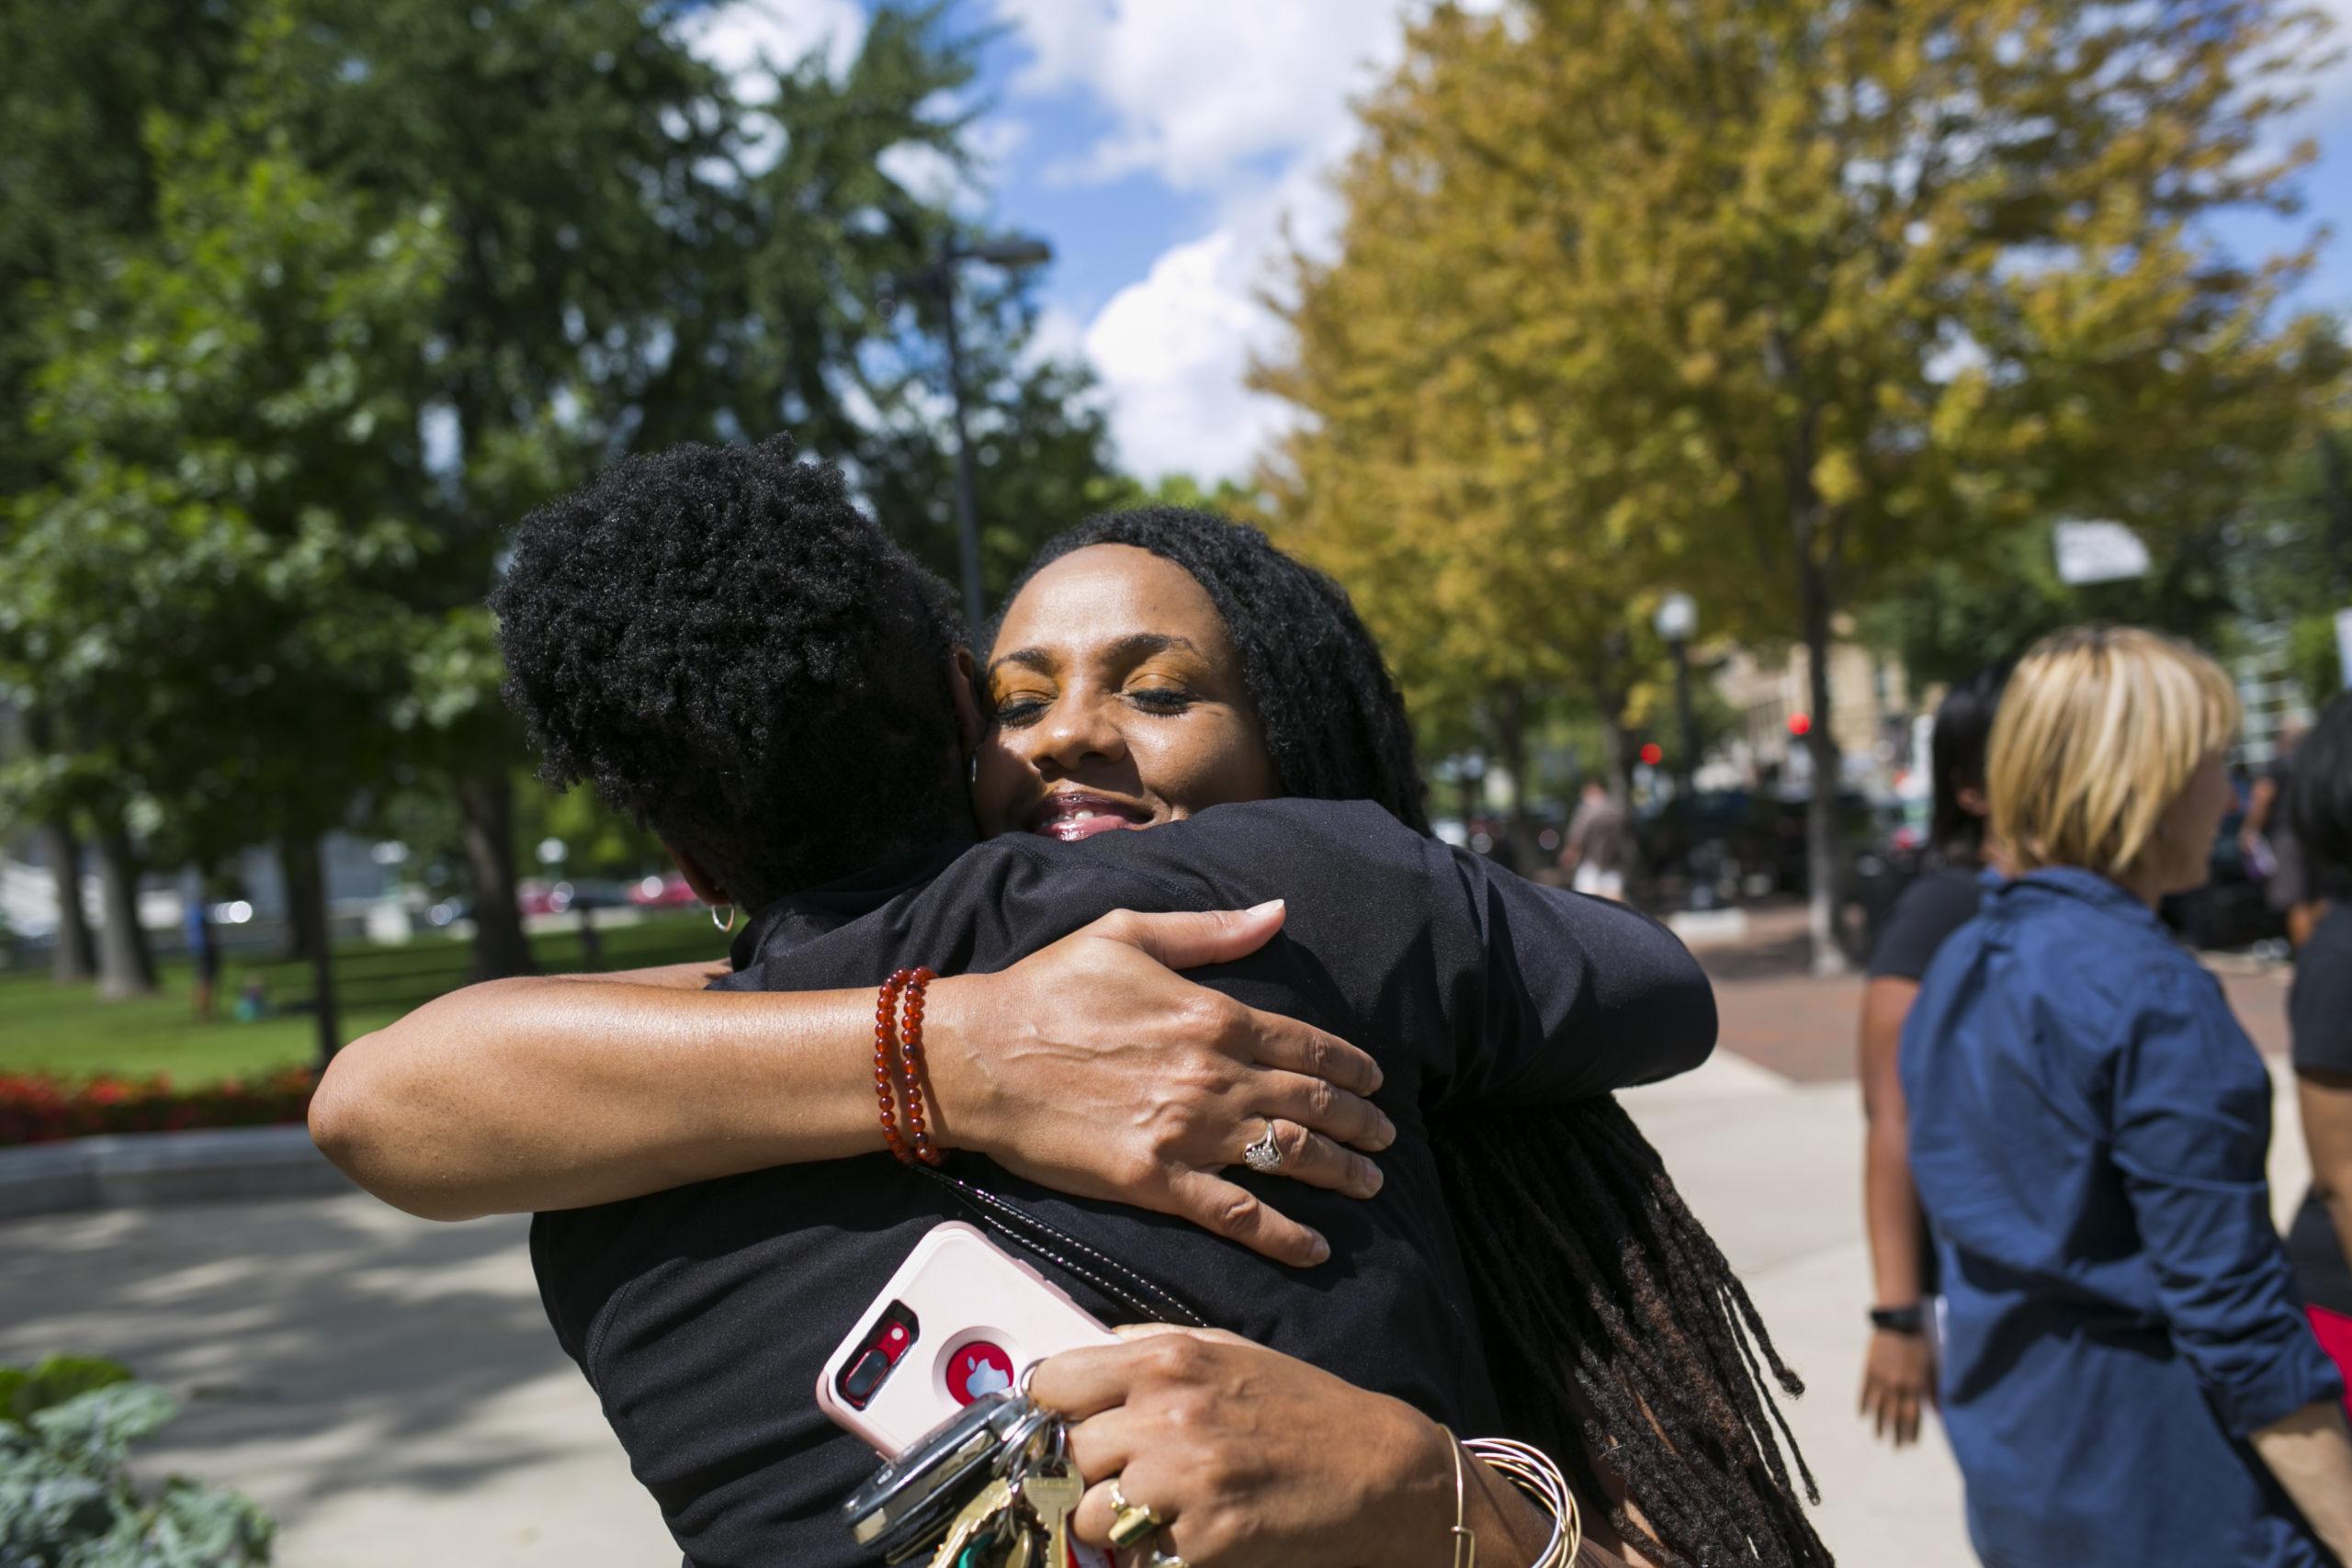 Two women hugging in the street